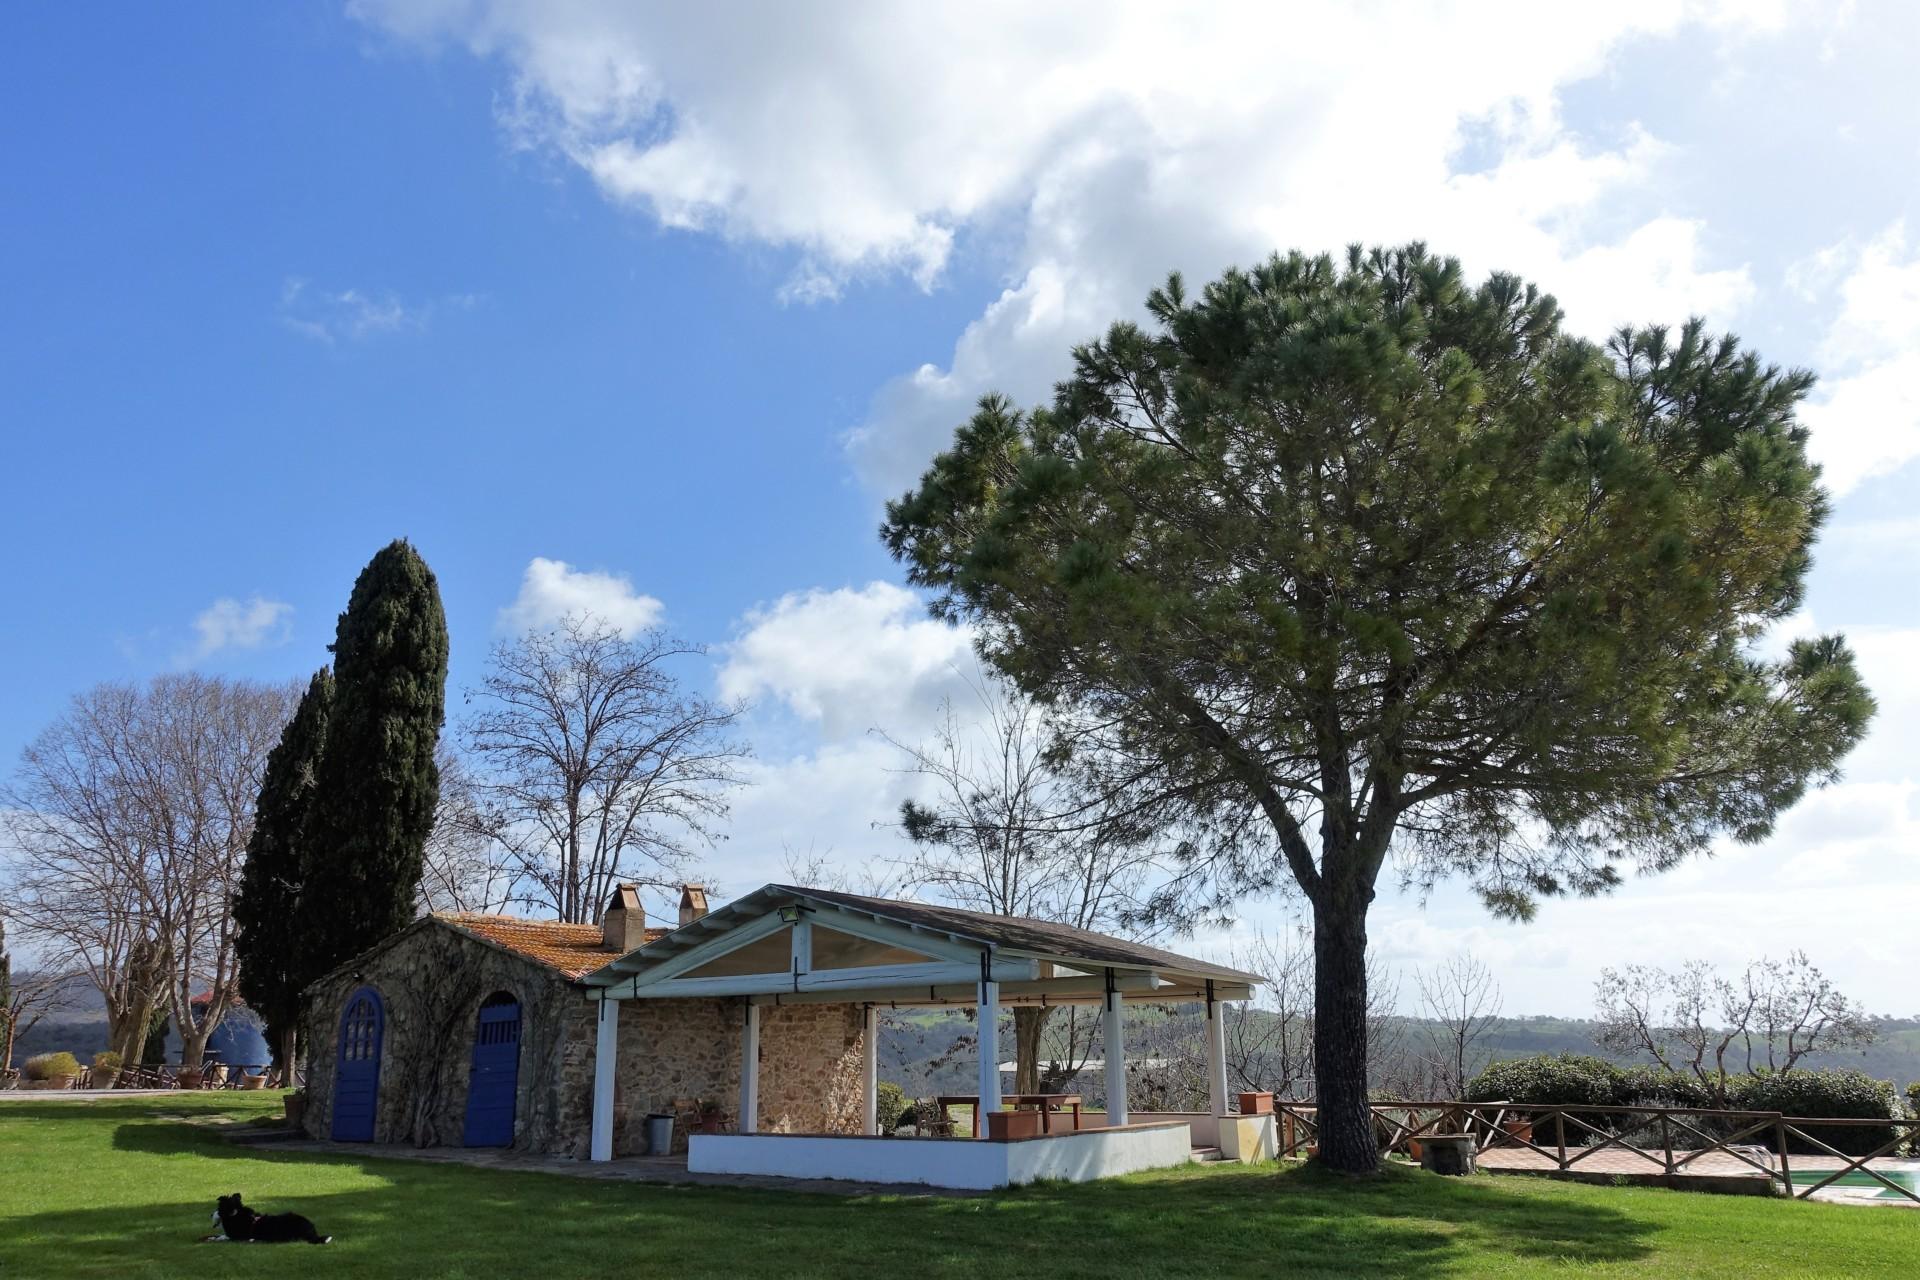 La Capitana, der Pavillon